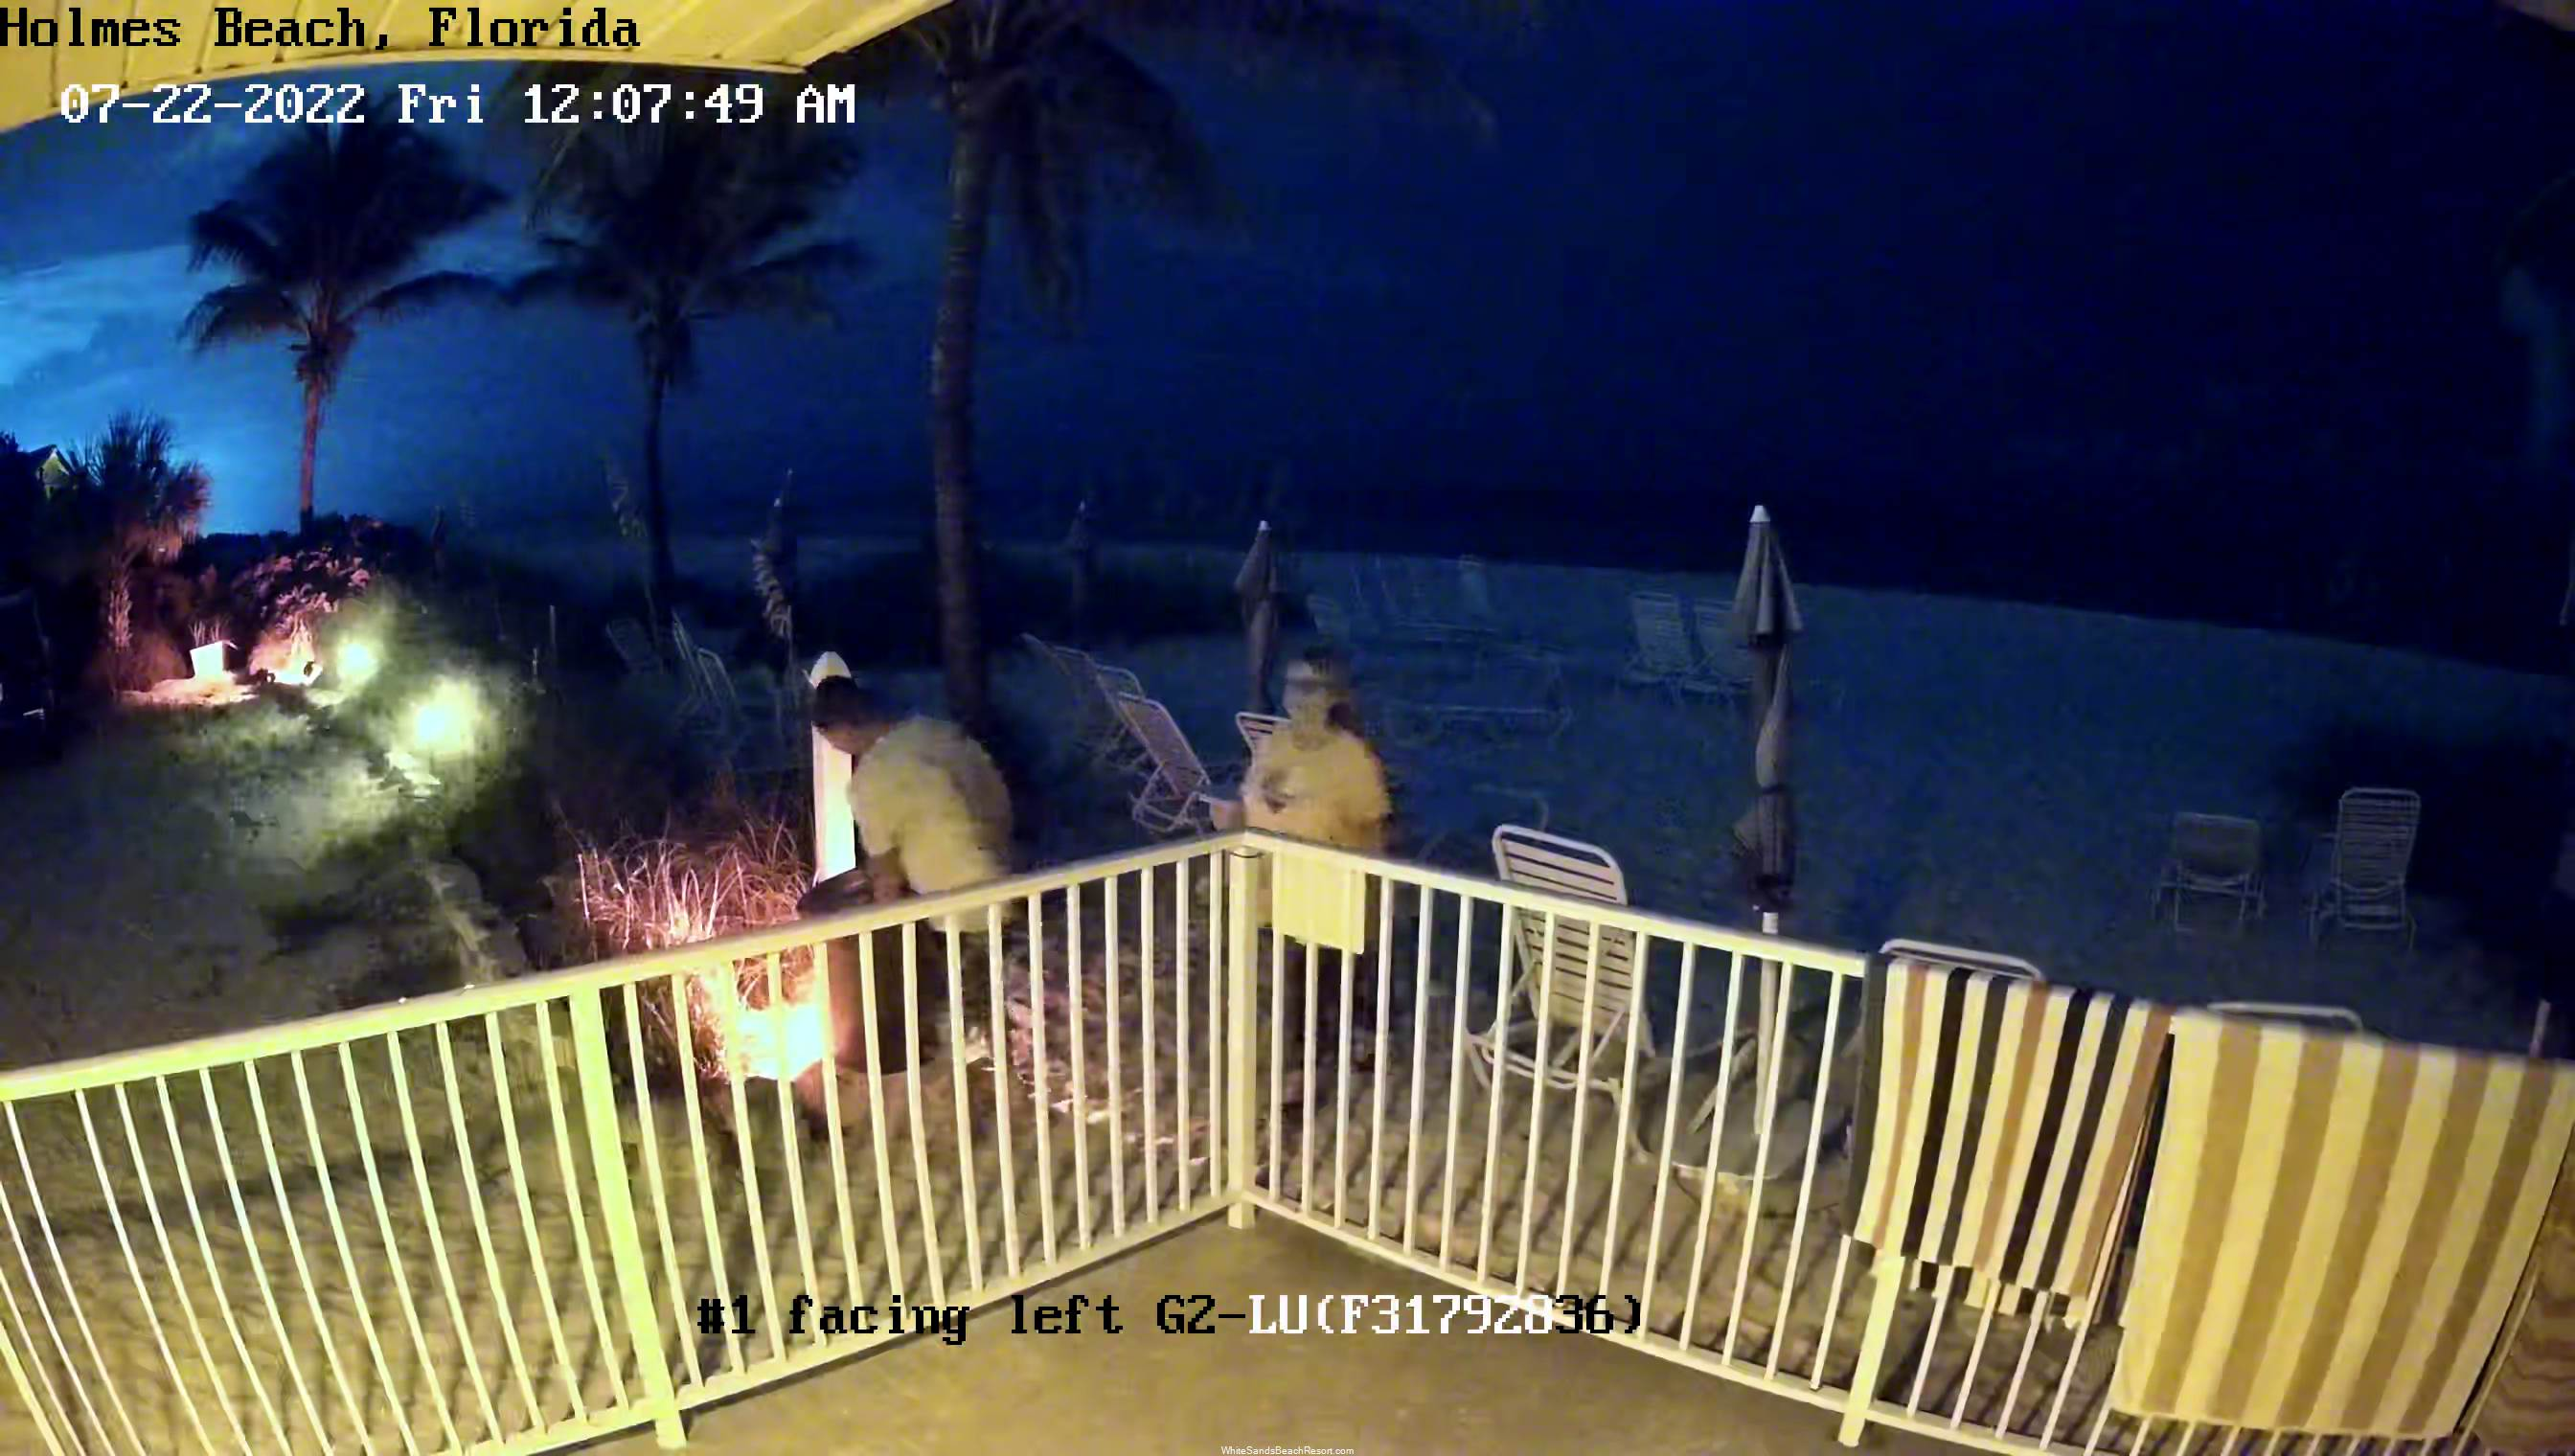 White Sands Beach Resort Webcam Beach View 2